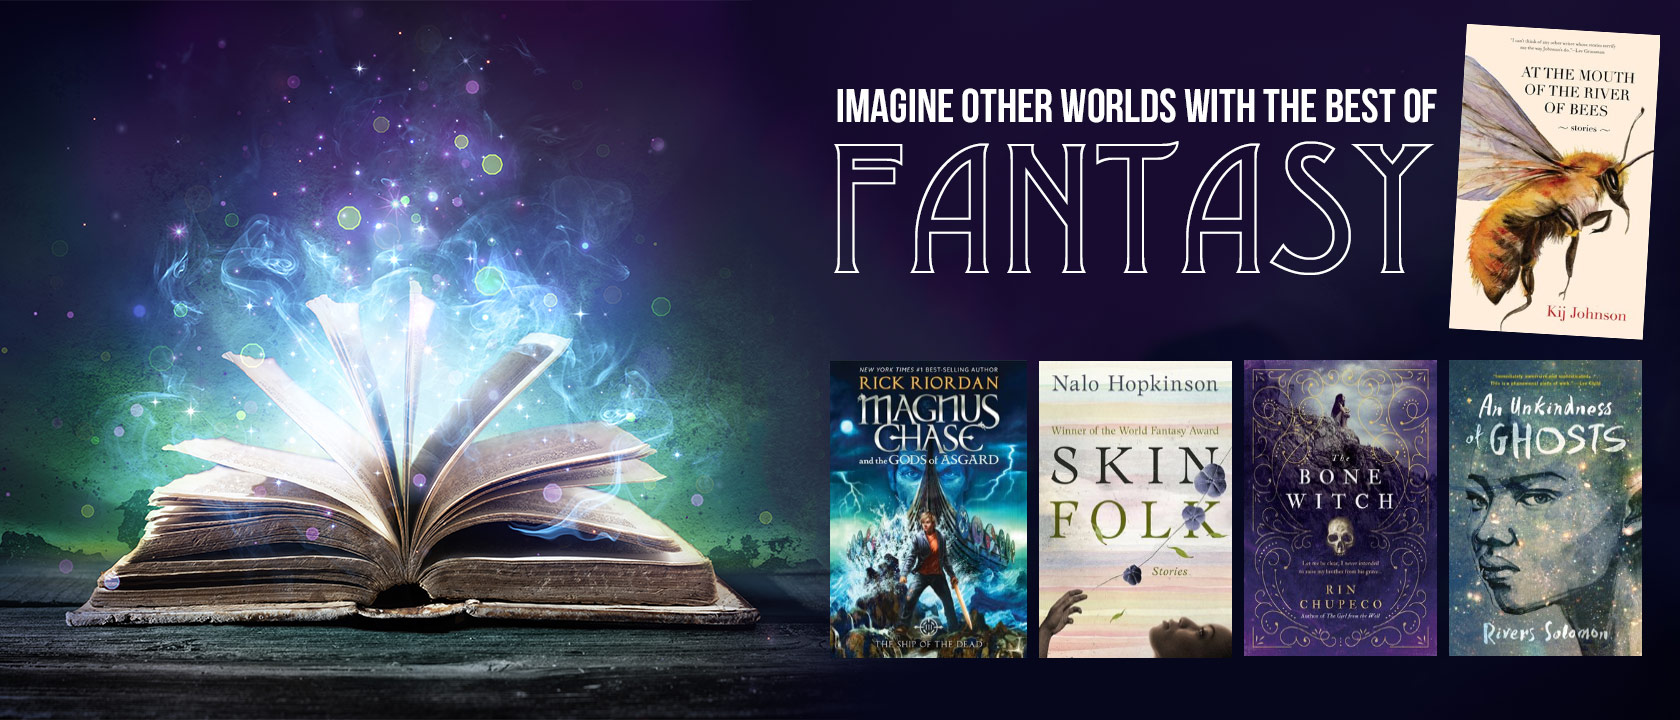 Read ebooks hoopla fantasyebooks thecodeoftheextraordinarymind fandeluxe Images